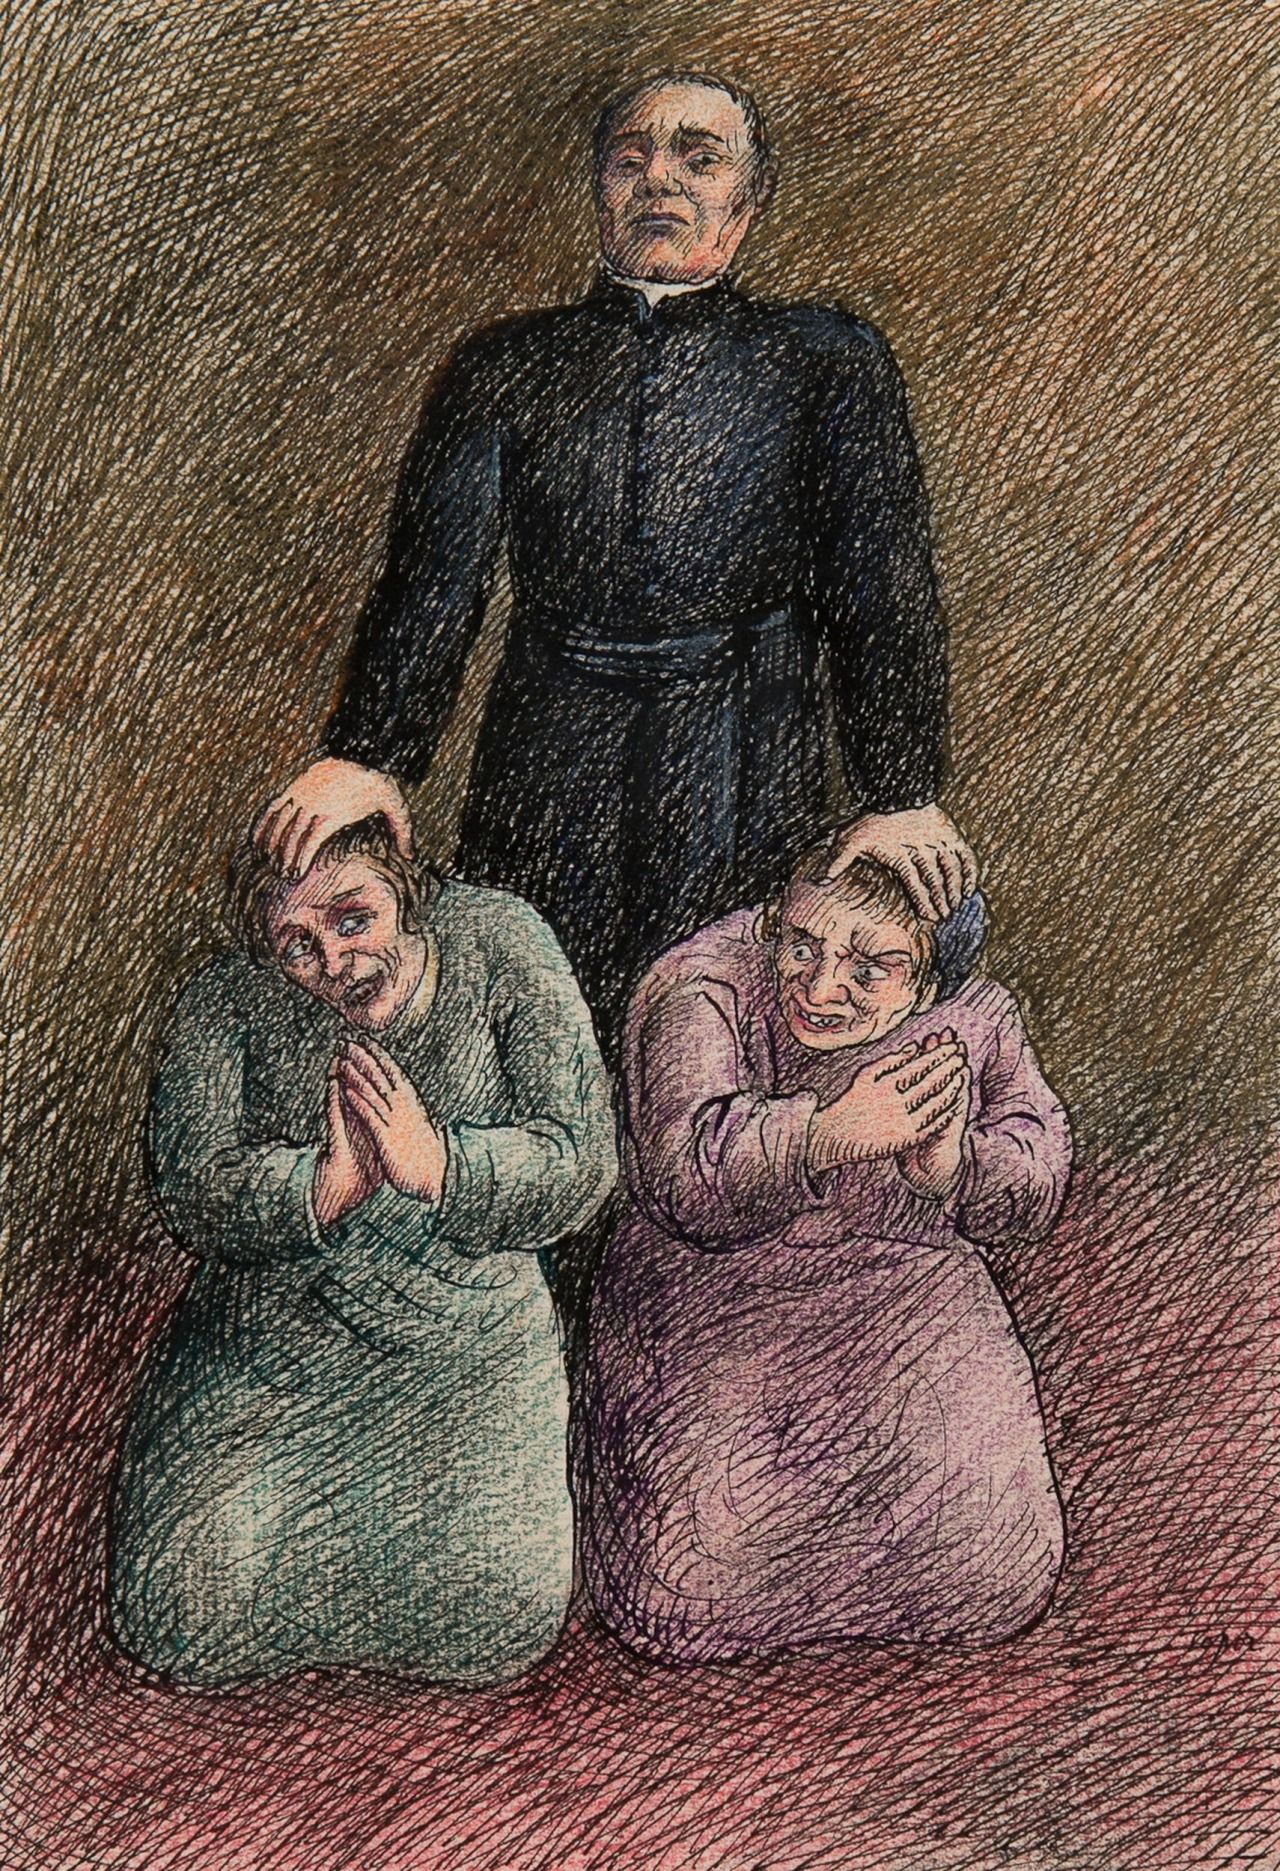 Vision Roland Topor French 1938 1997 La Table Aux Creepy Faces Illustration Art Illustration